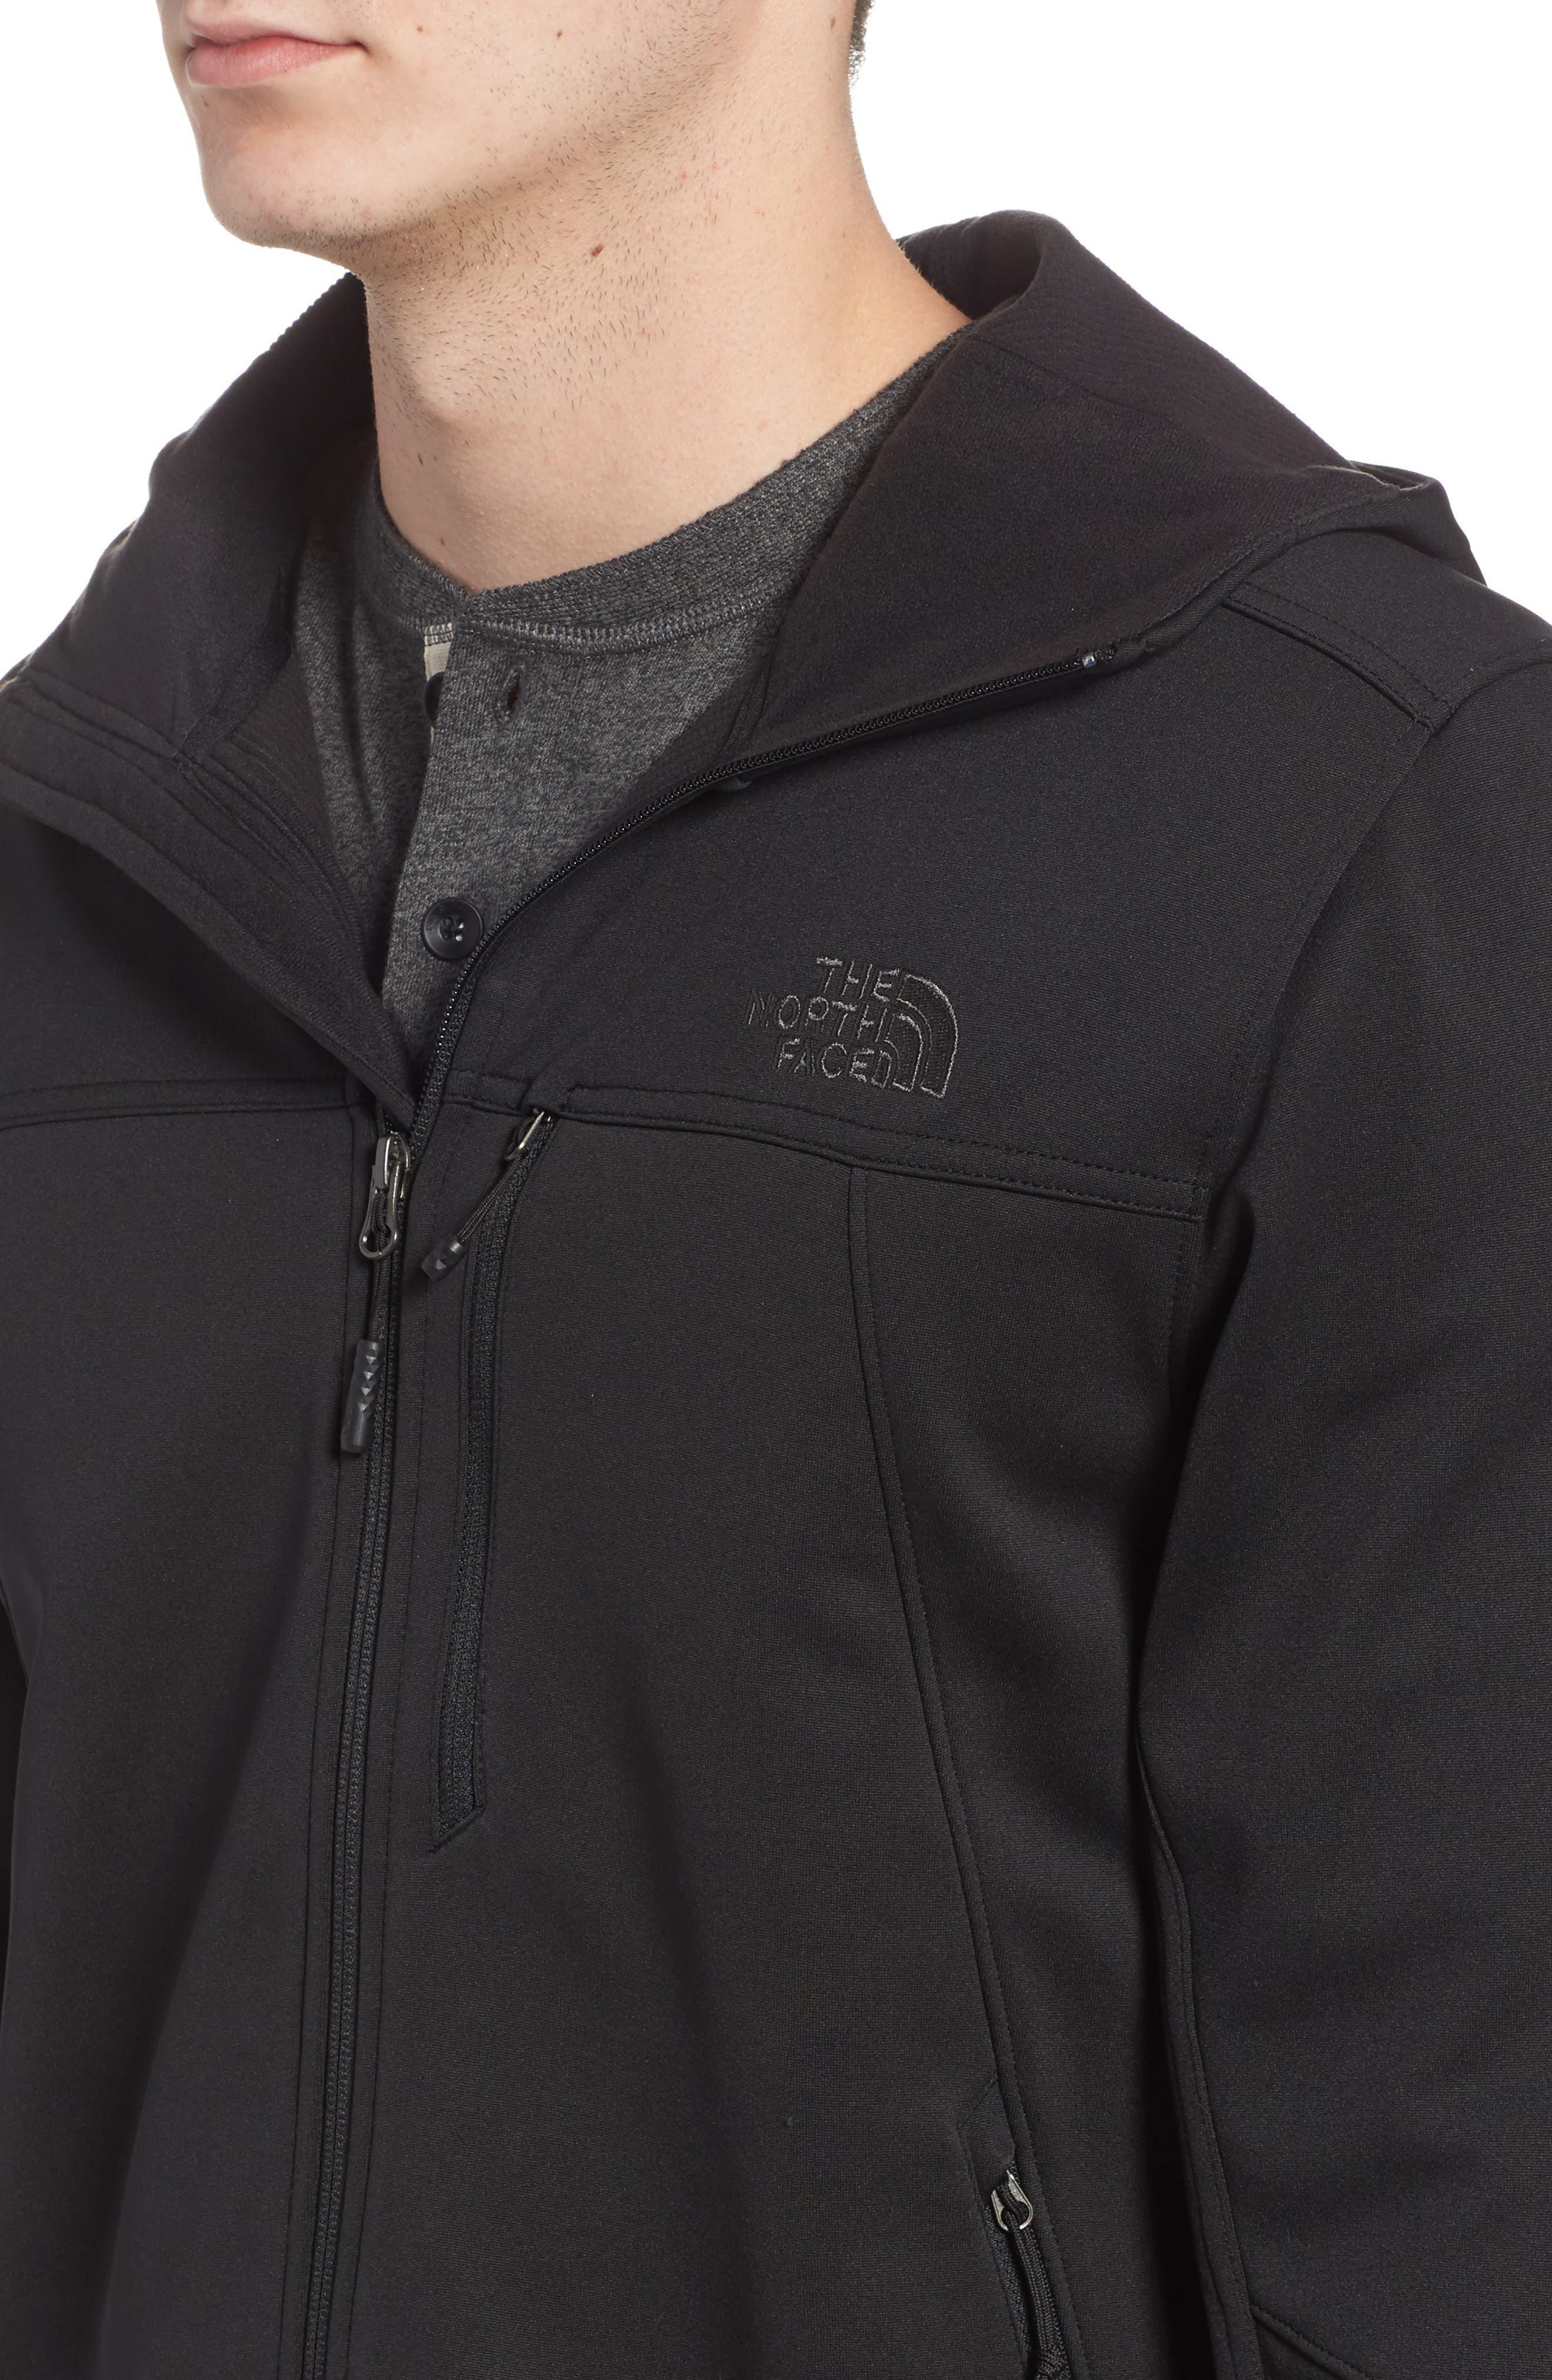 Apex Canyonwall Hybrid Jacket,                             Alternate thumbnail 4, color,                             001